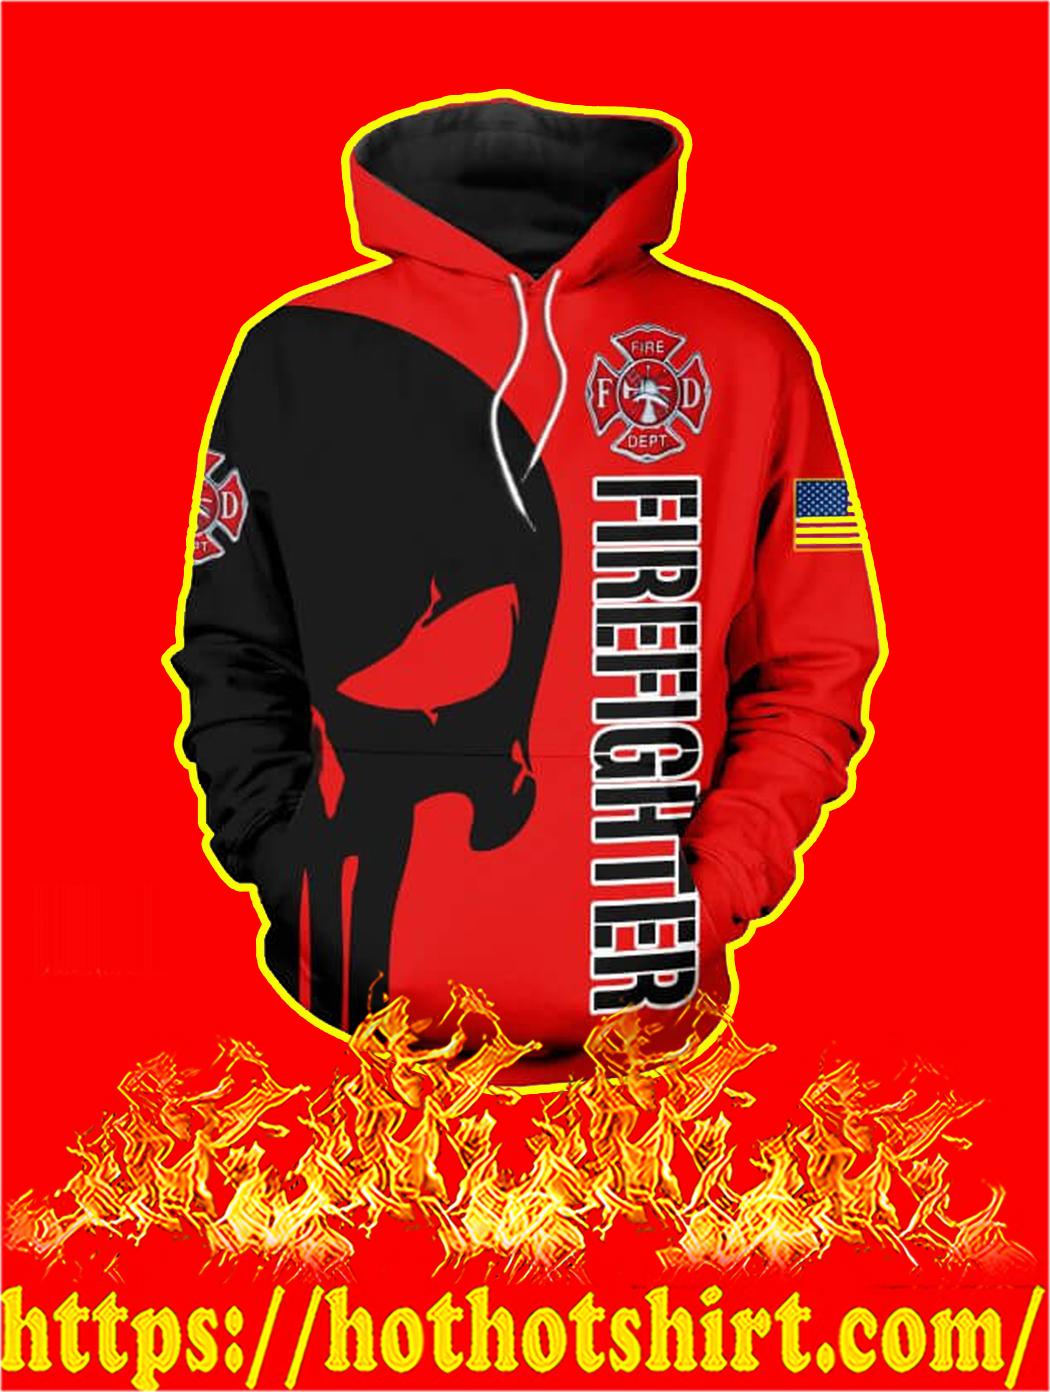 3D Printed Firefighter Punisher Skull Hoodie